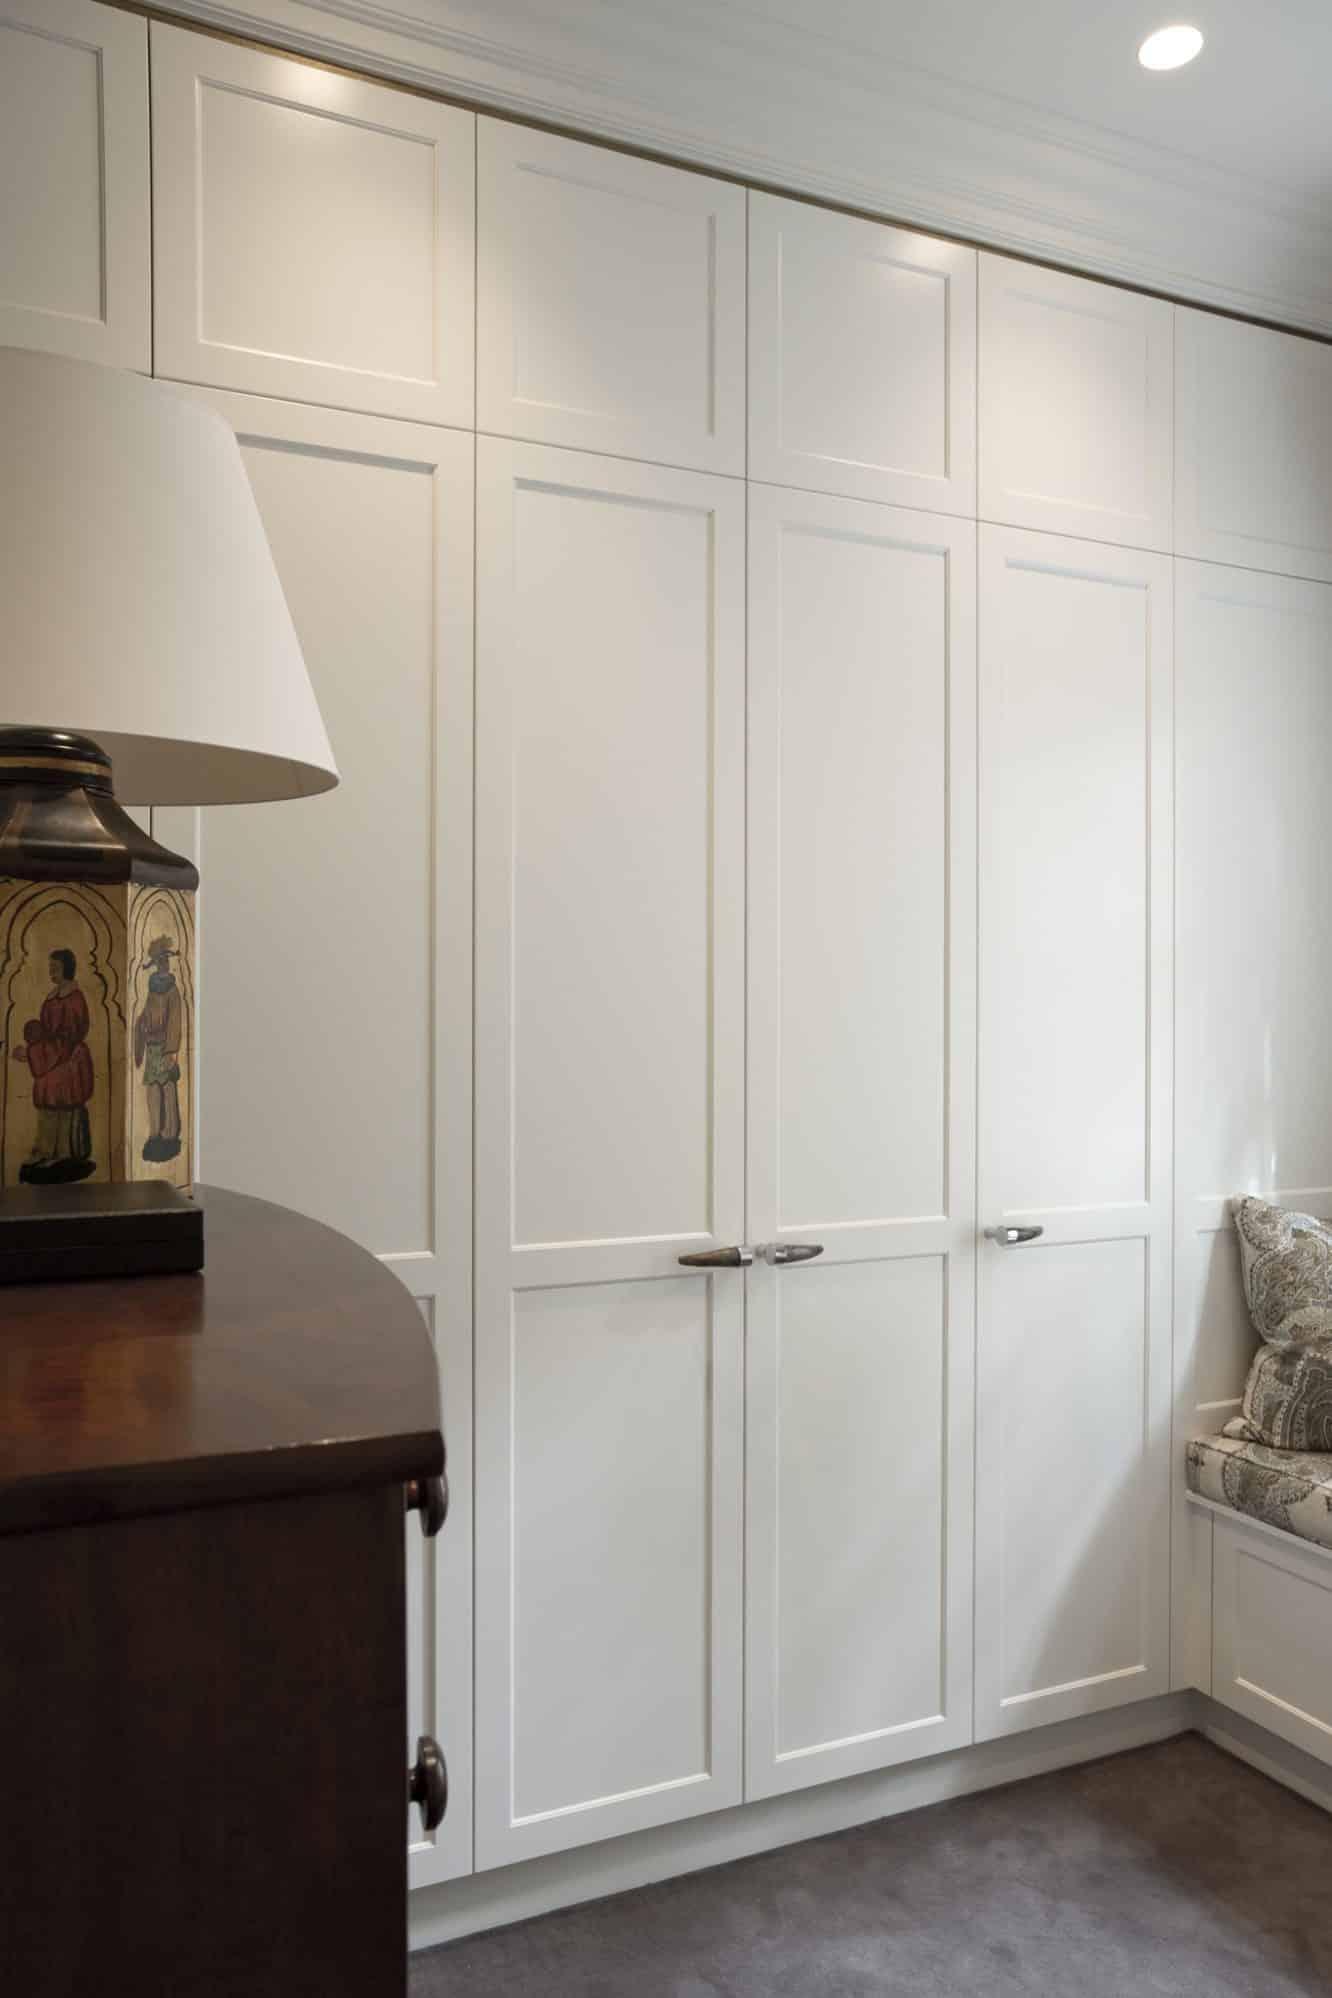 Classic shaker profile doors